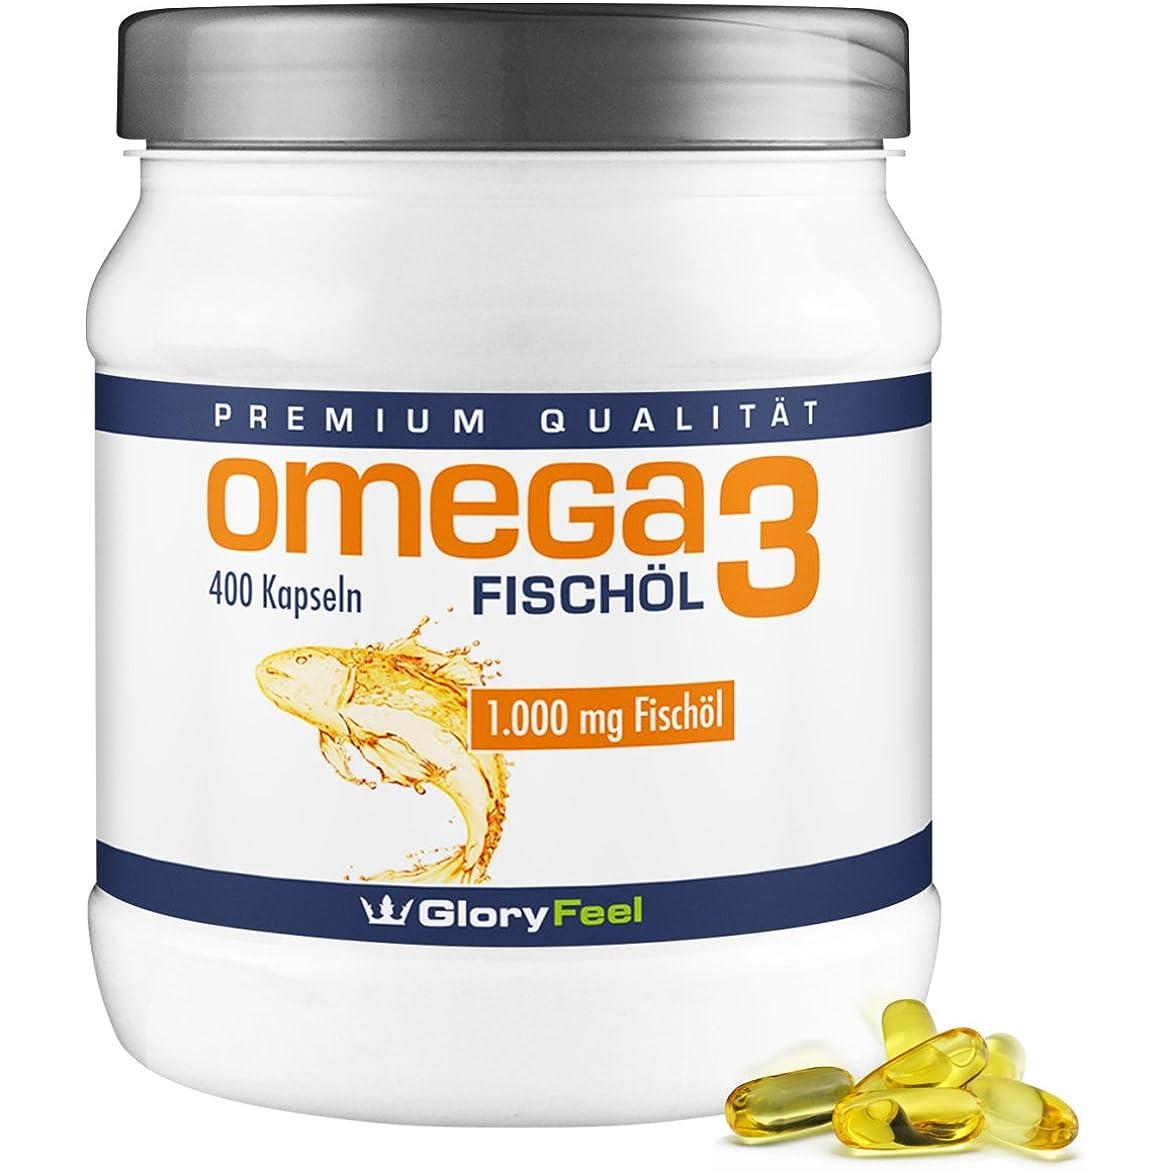 gloryfeel Omega 3 Fischöl-Kapseln